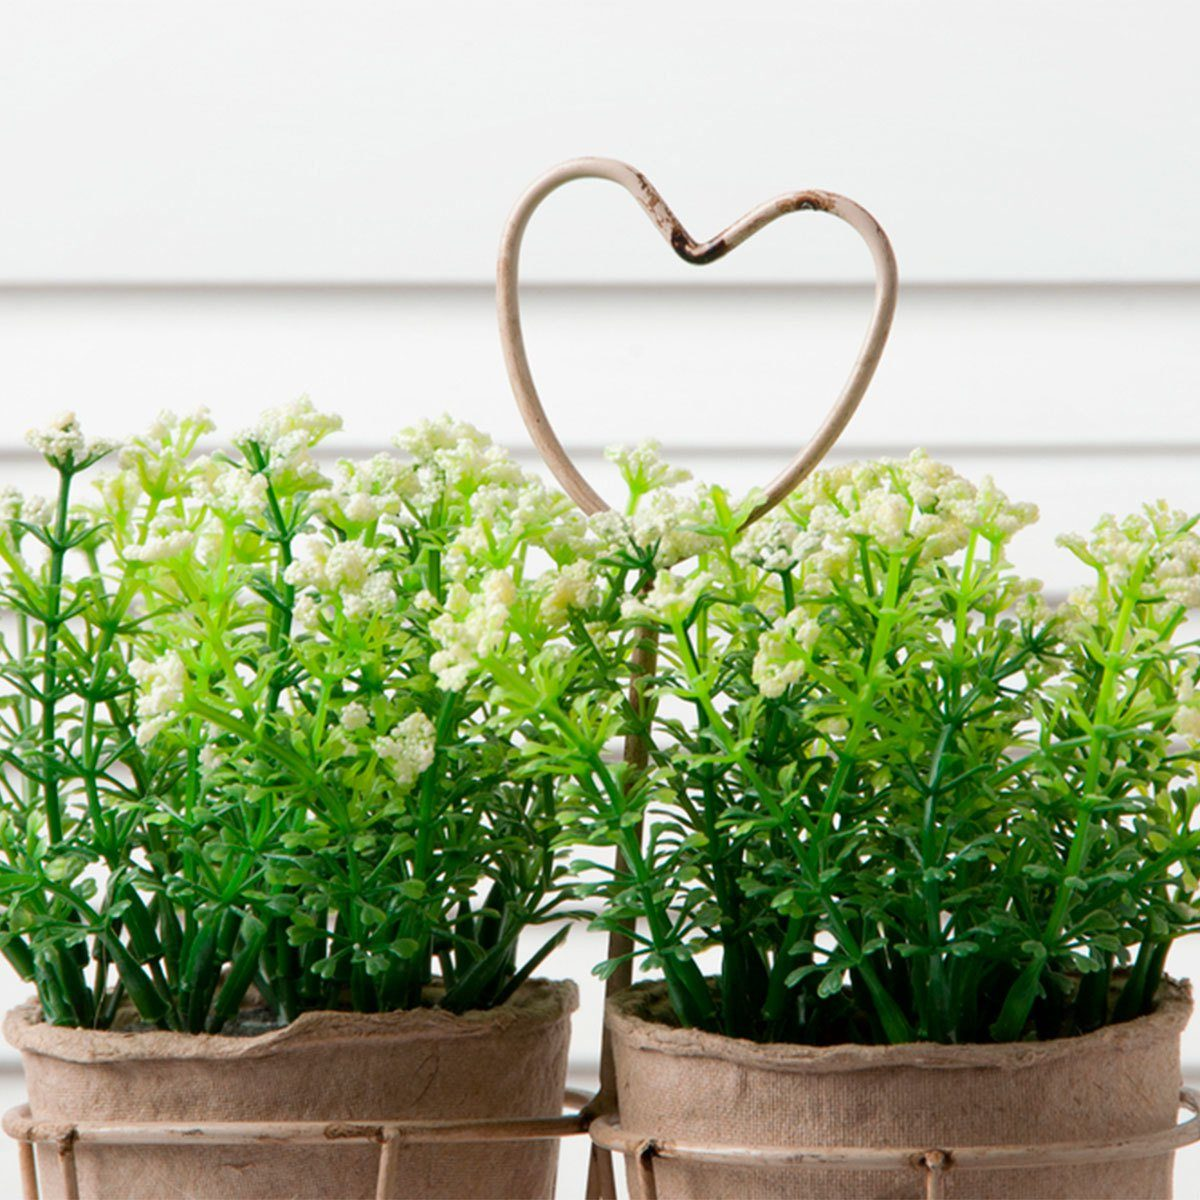 greenery plant